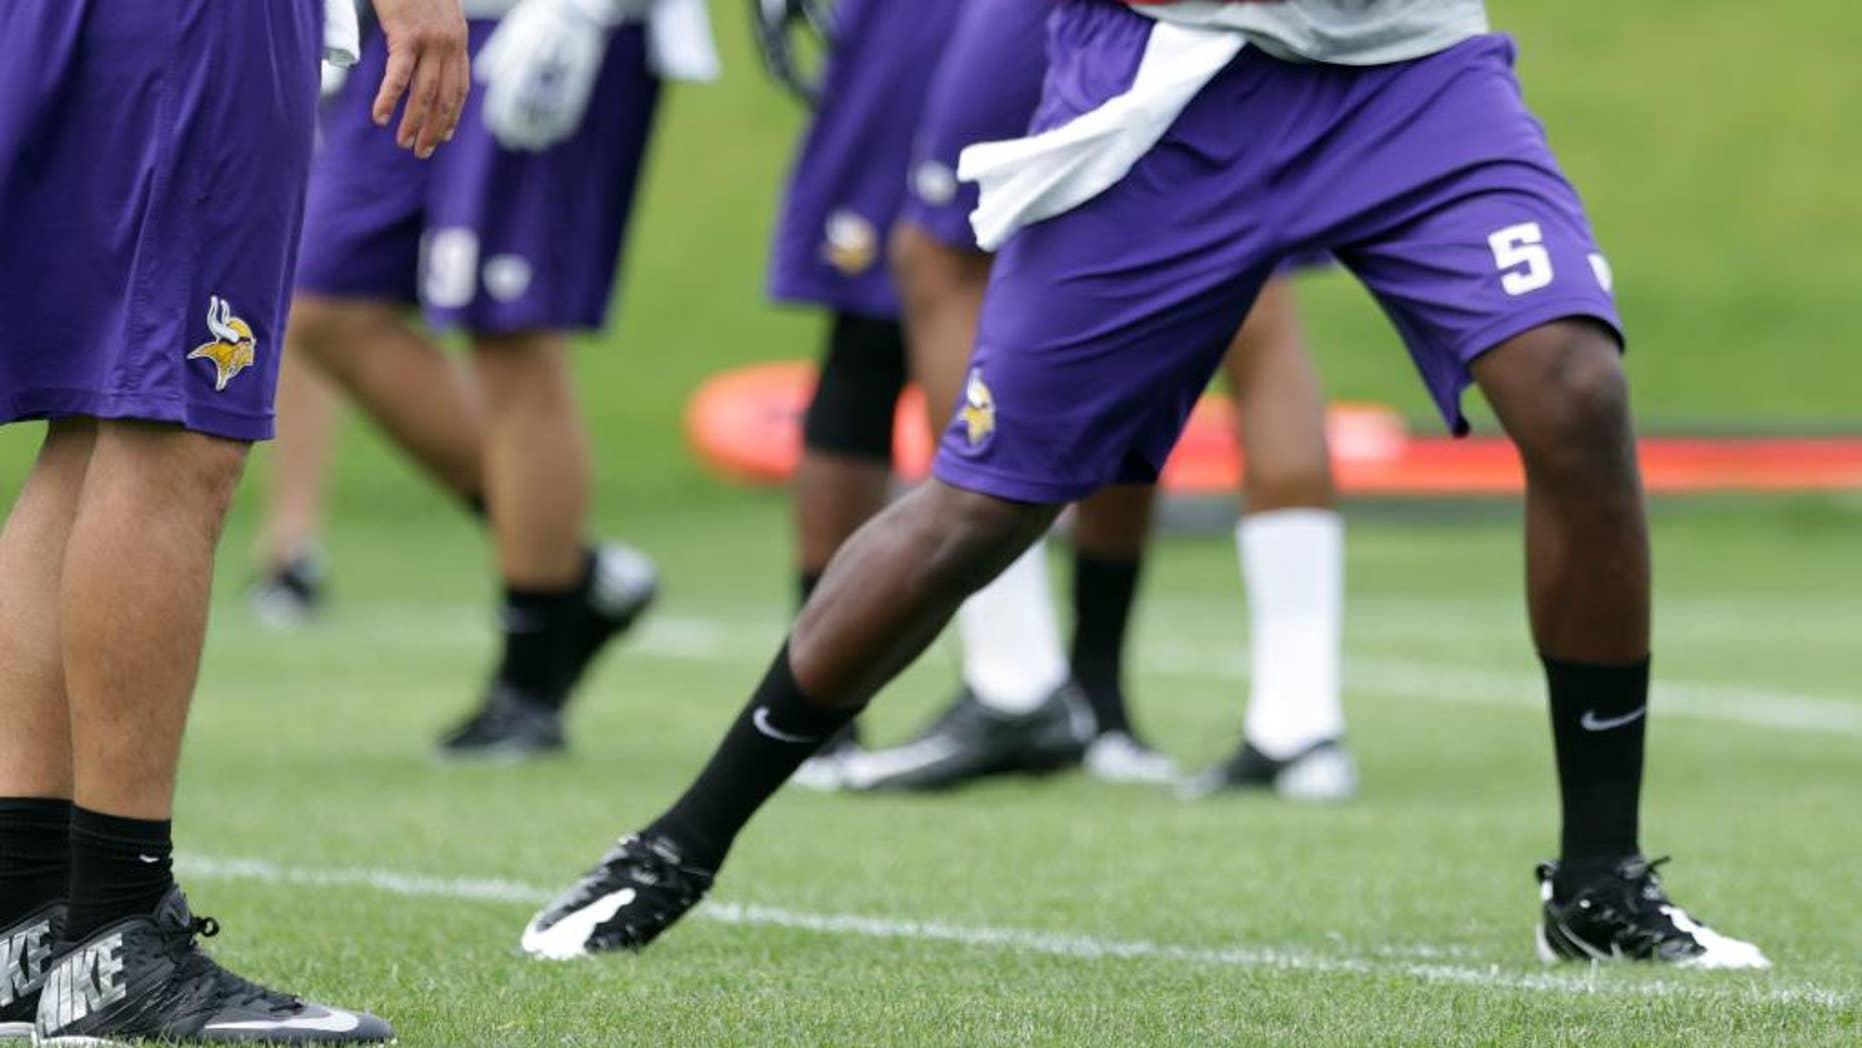 Minnesota Vikings quarterback Matt Cassel, left, watches as rookie quarterback Teddy Bridgewater throws during NFL football minicamp Wednesday, June 18, 2014, in Eden Prairie, Minn. (AP Photo/Jim Mone)